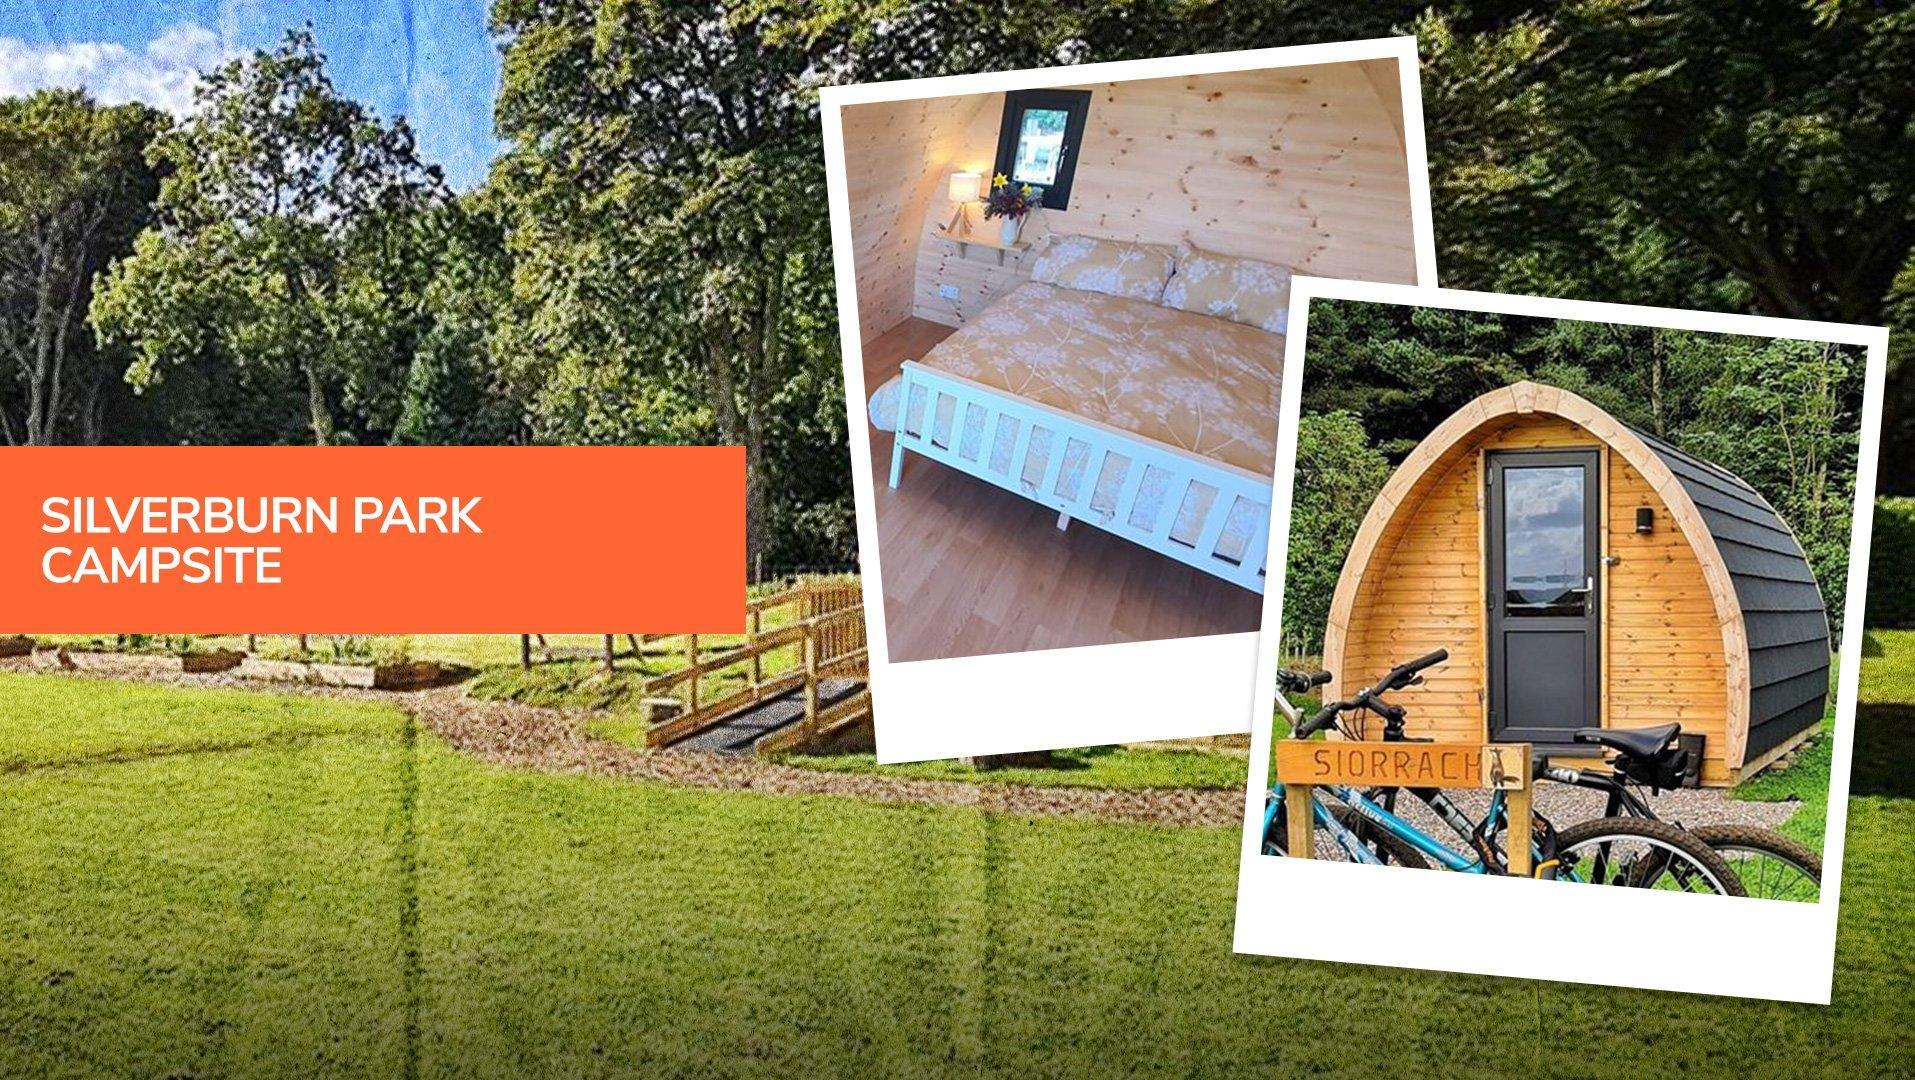 Silverburn Park, one of the best camping in Edinburgh destinations